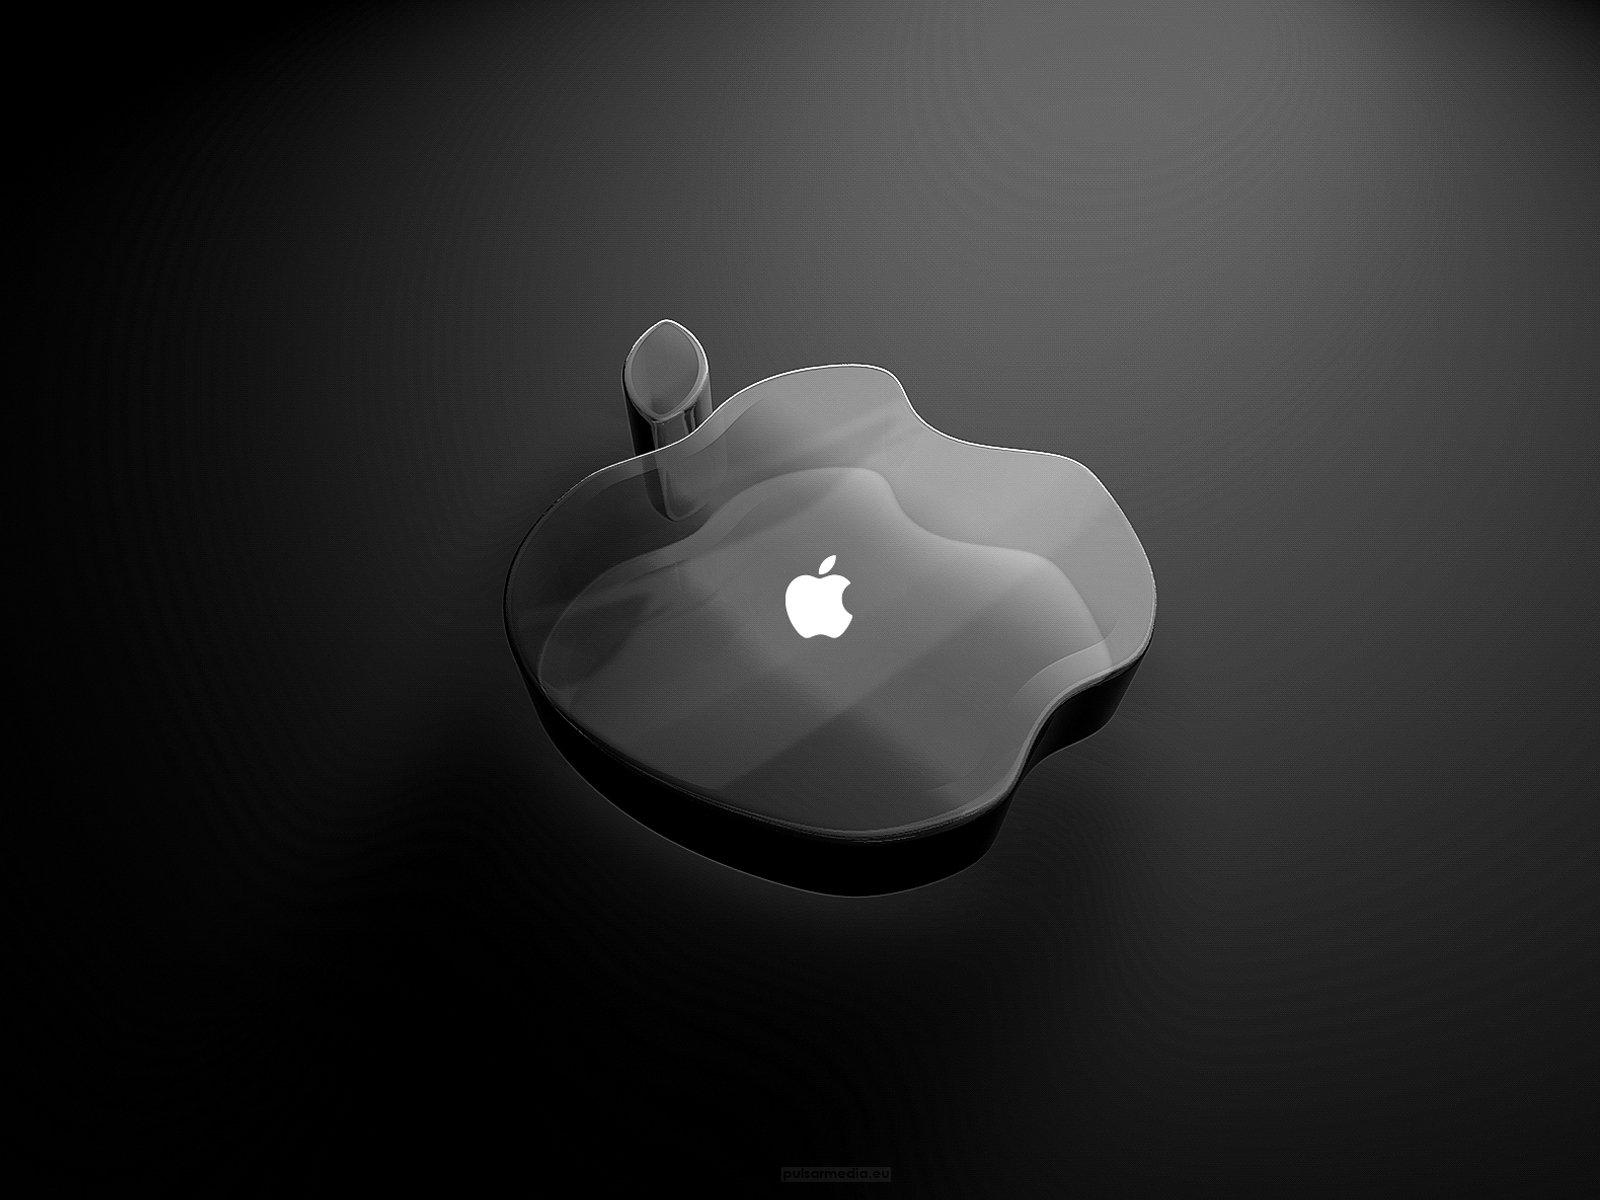 Amazing Apple HD Wallpaper 1600x1200